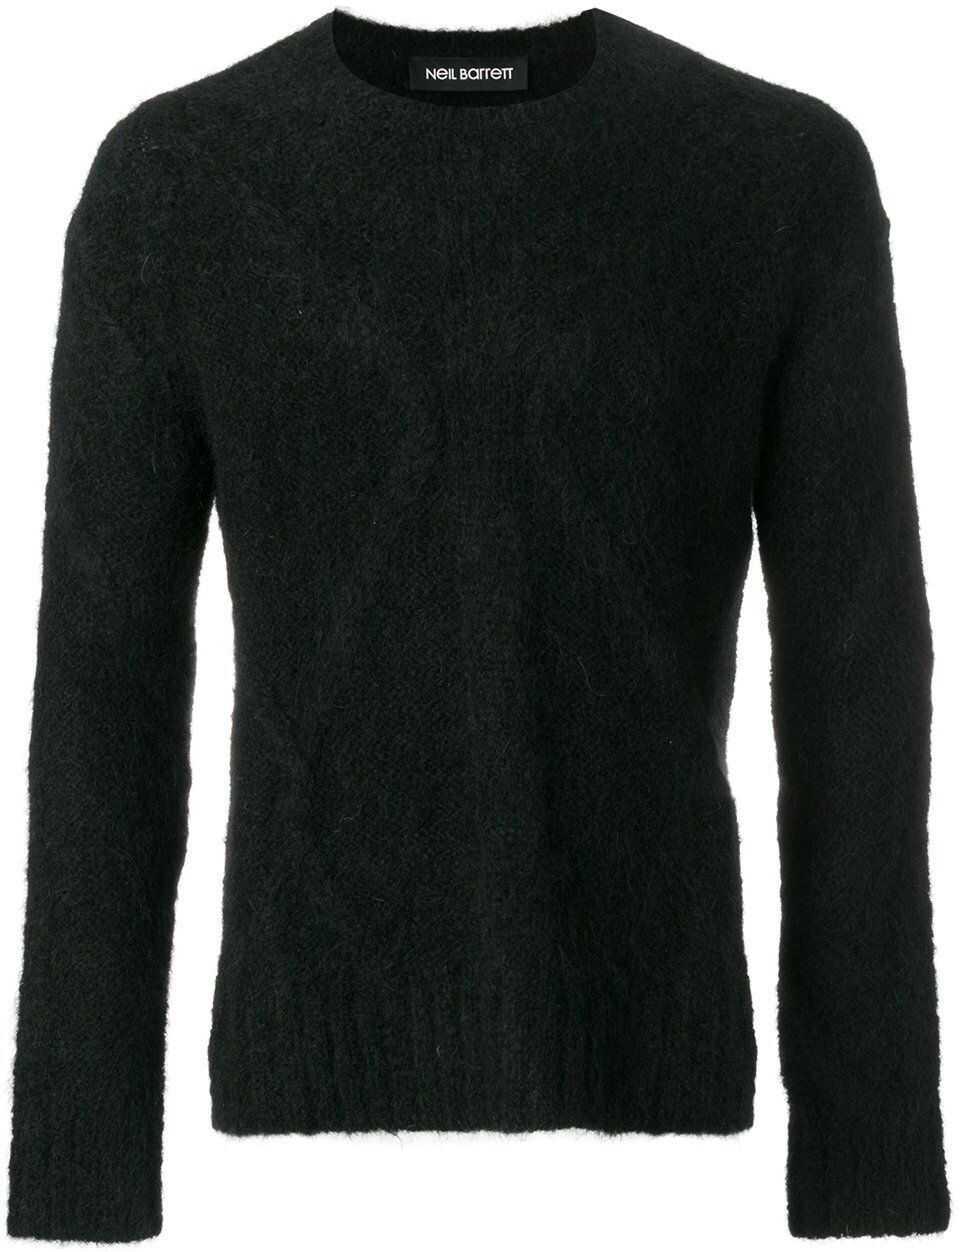 Neil Barrett Wool Sweater BLACK